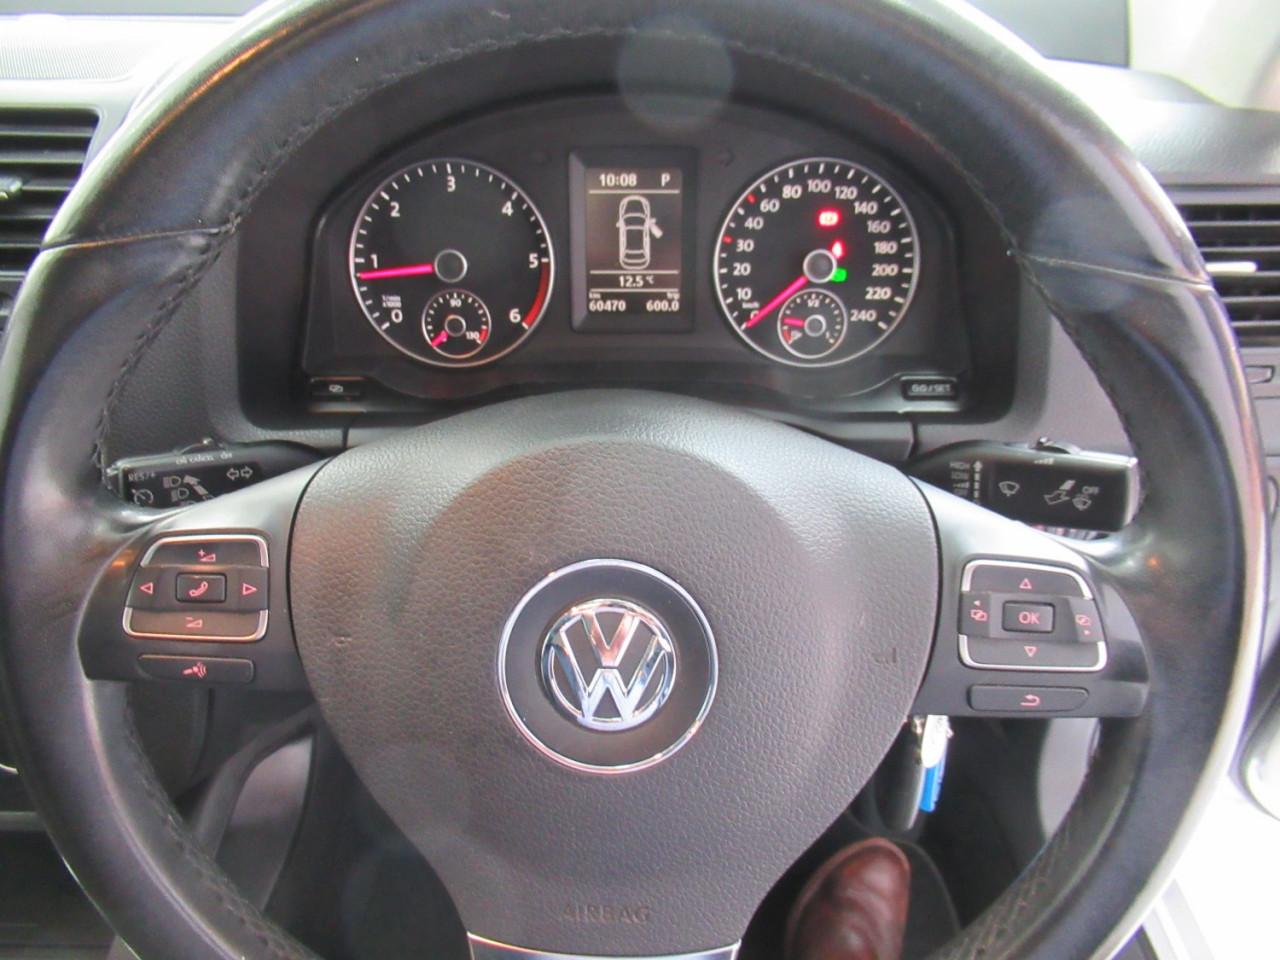 2010 Volkswagen Jetta 1KM MY10 103TDI Sedan Image 24